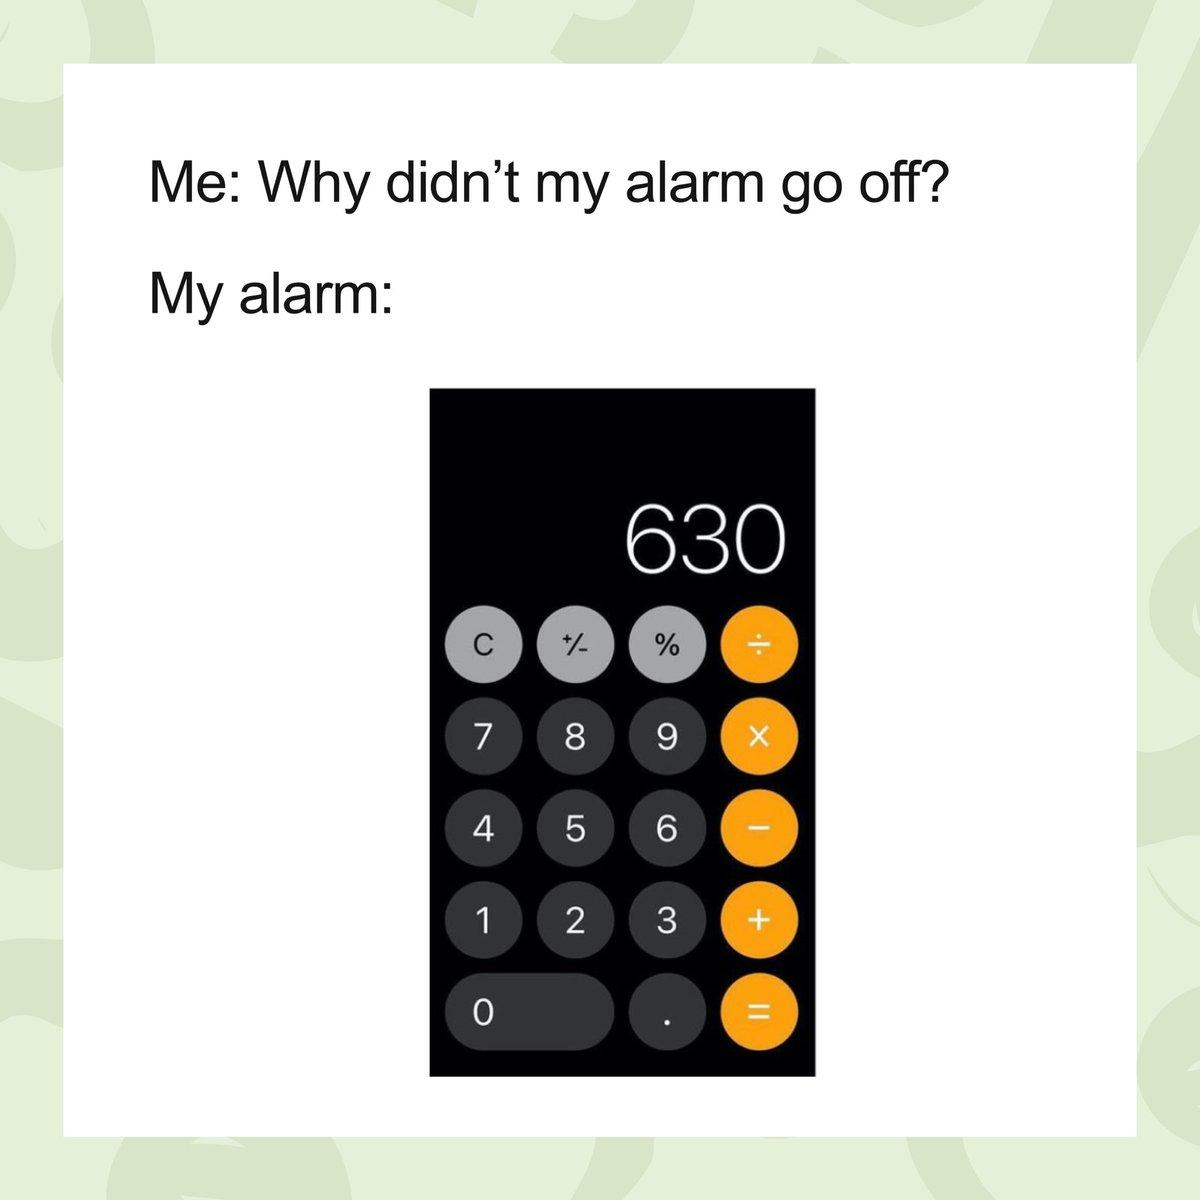 Please tell us we aren't the only ones 😐  #struggle #properwild #alarm #alarmclock #alarmclocks #lol #meme #funny #goodmorning #monday #mondaymood #mondayvibes #calculator #morningmemes #memes #memes😂